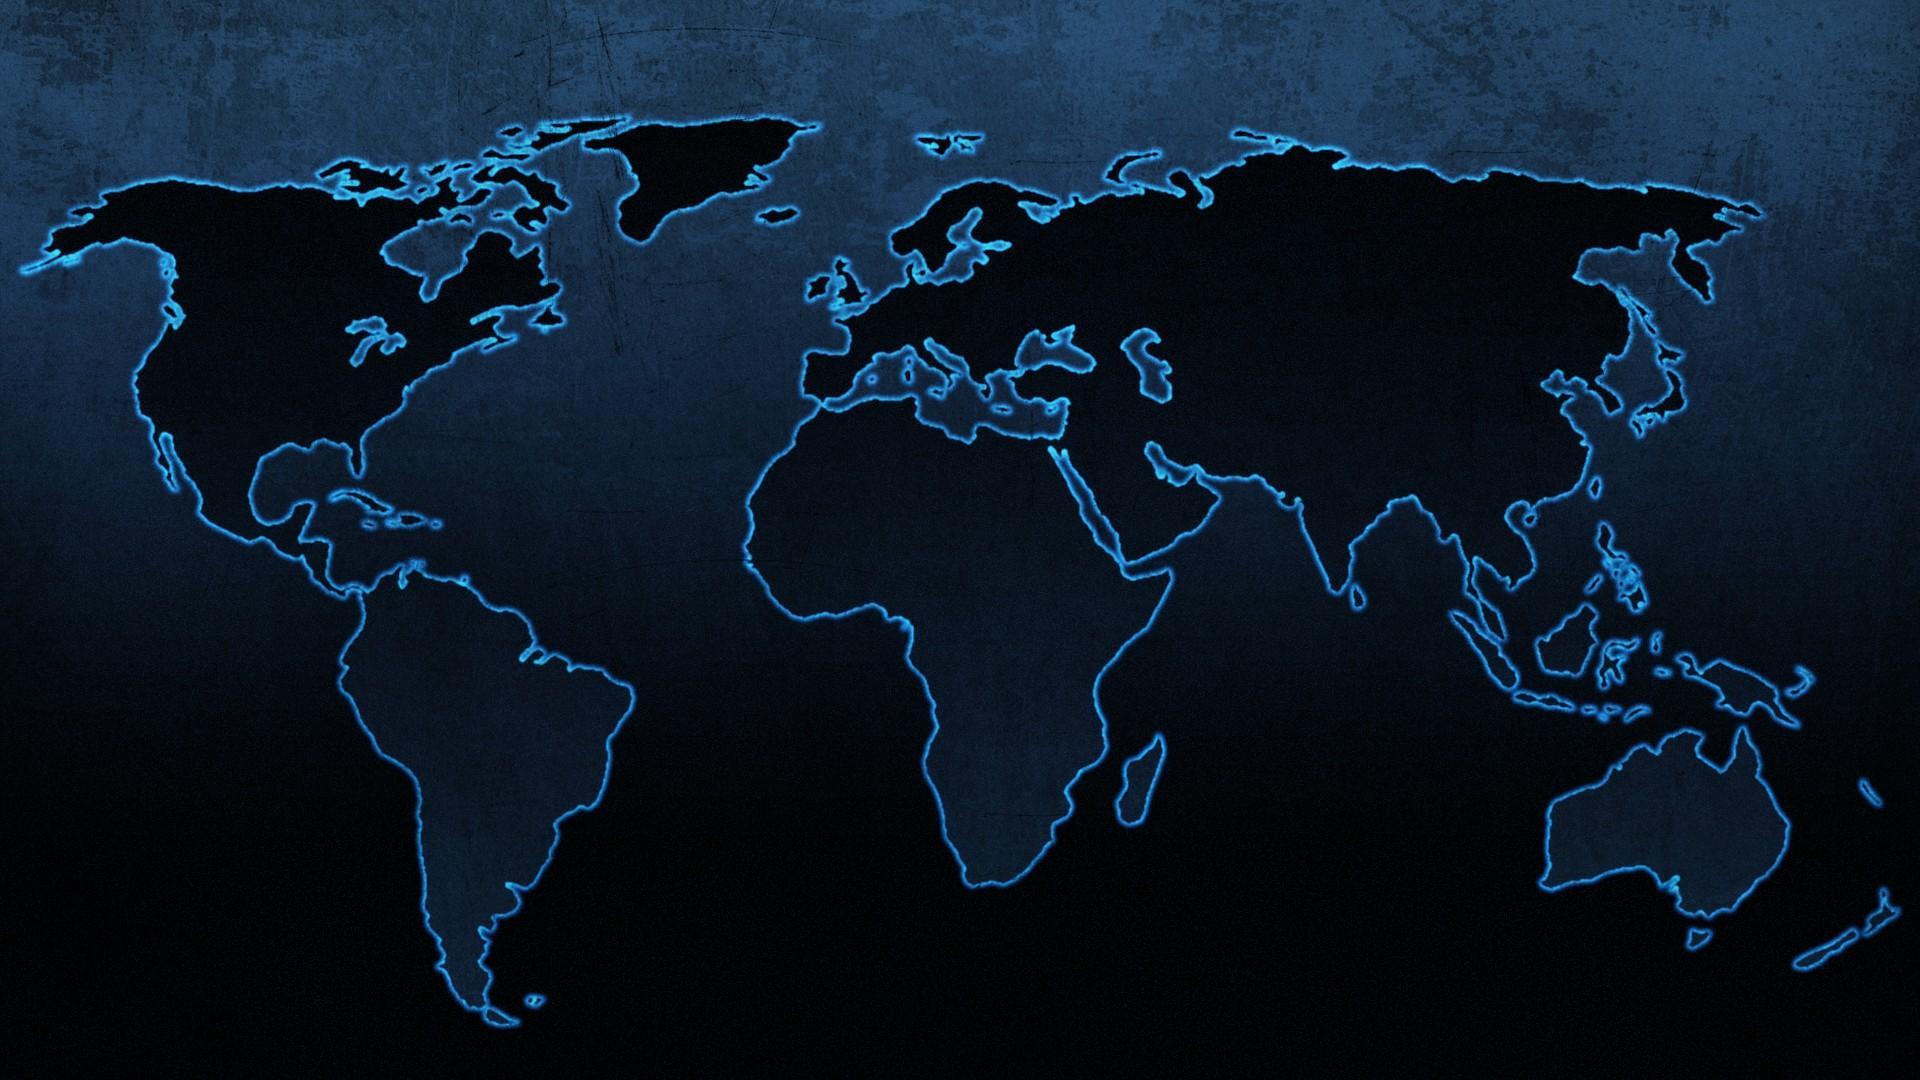 World Map Hd Wallpaper Wallpapersafari